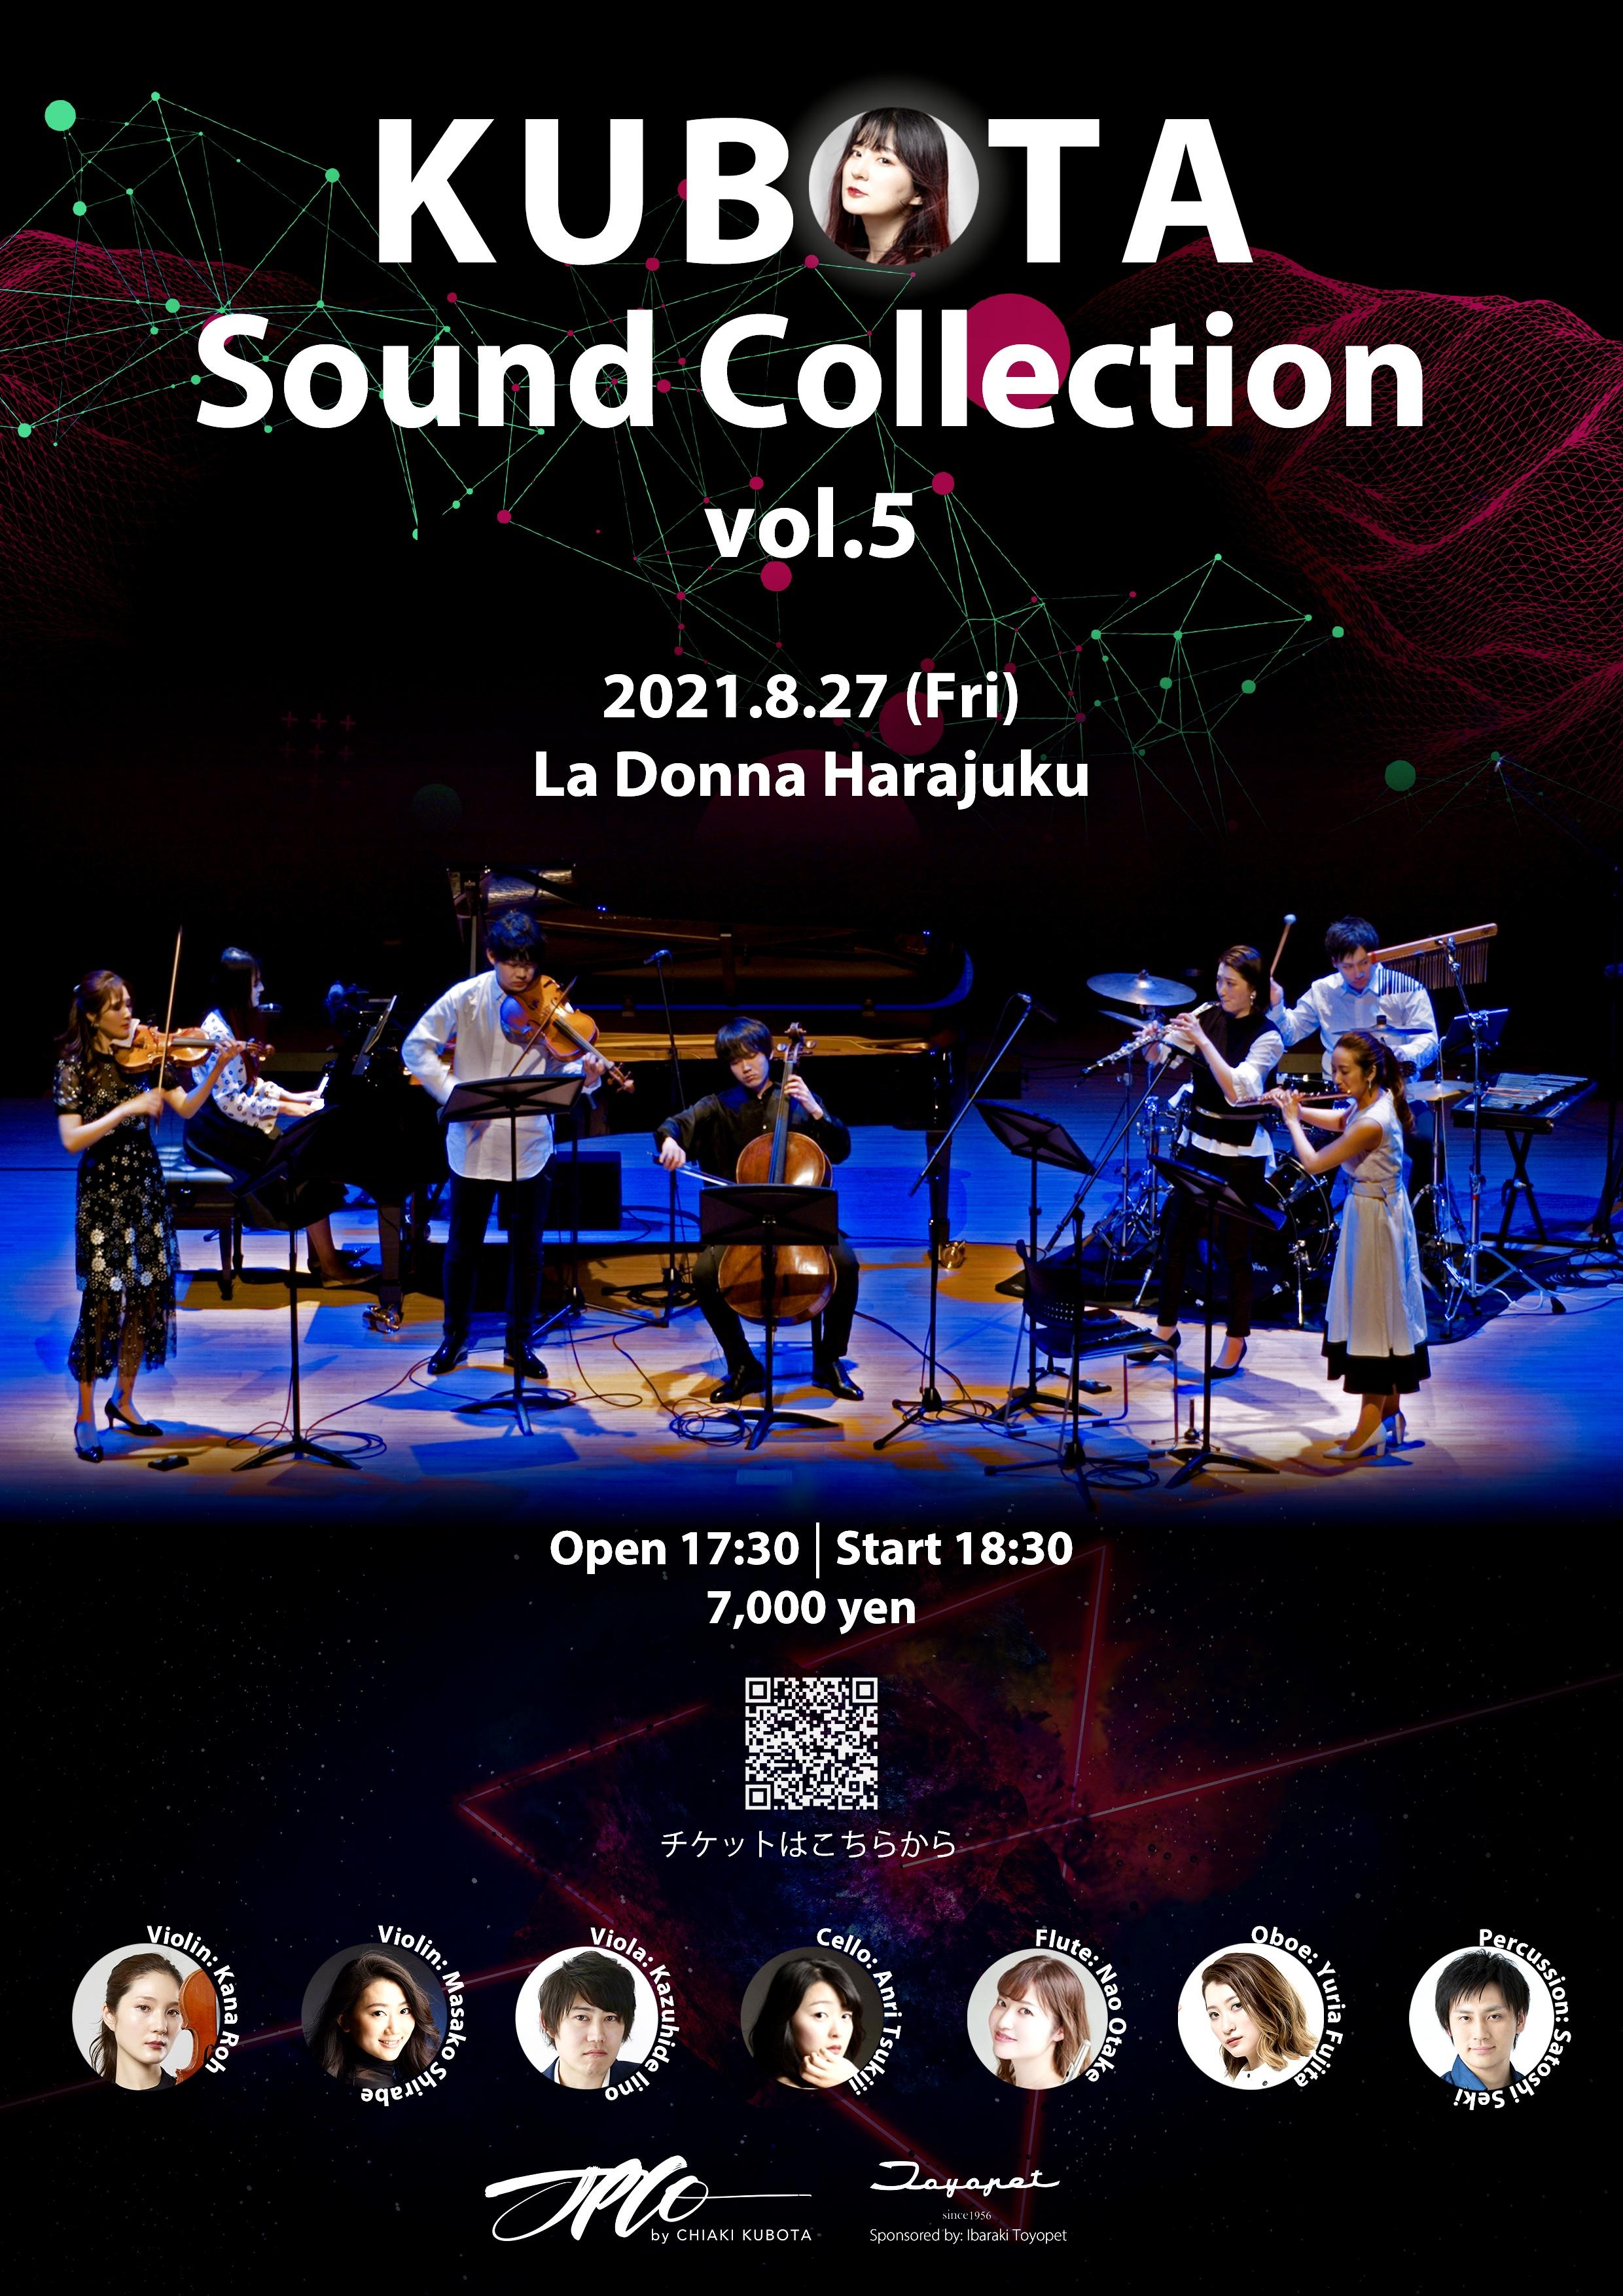 KUBOTA Sound Collection vol.5